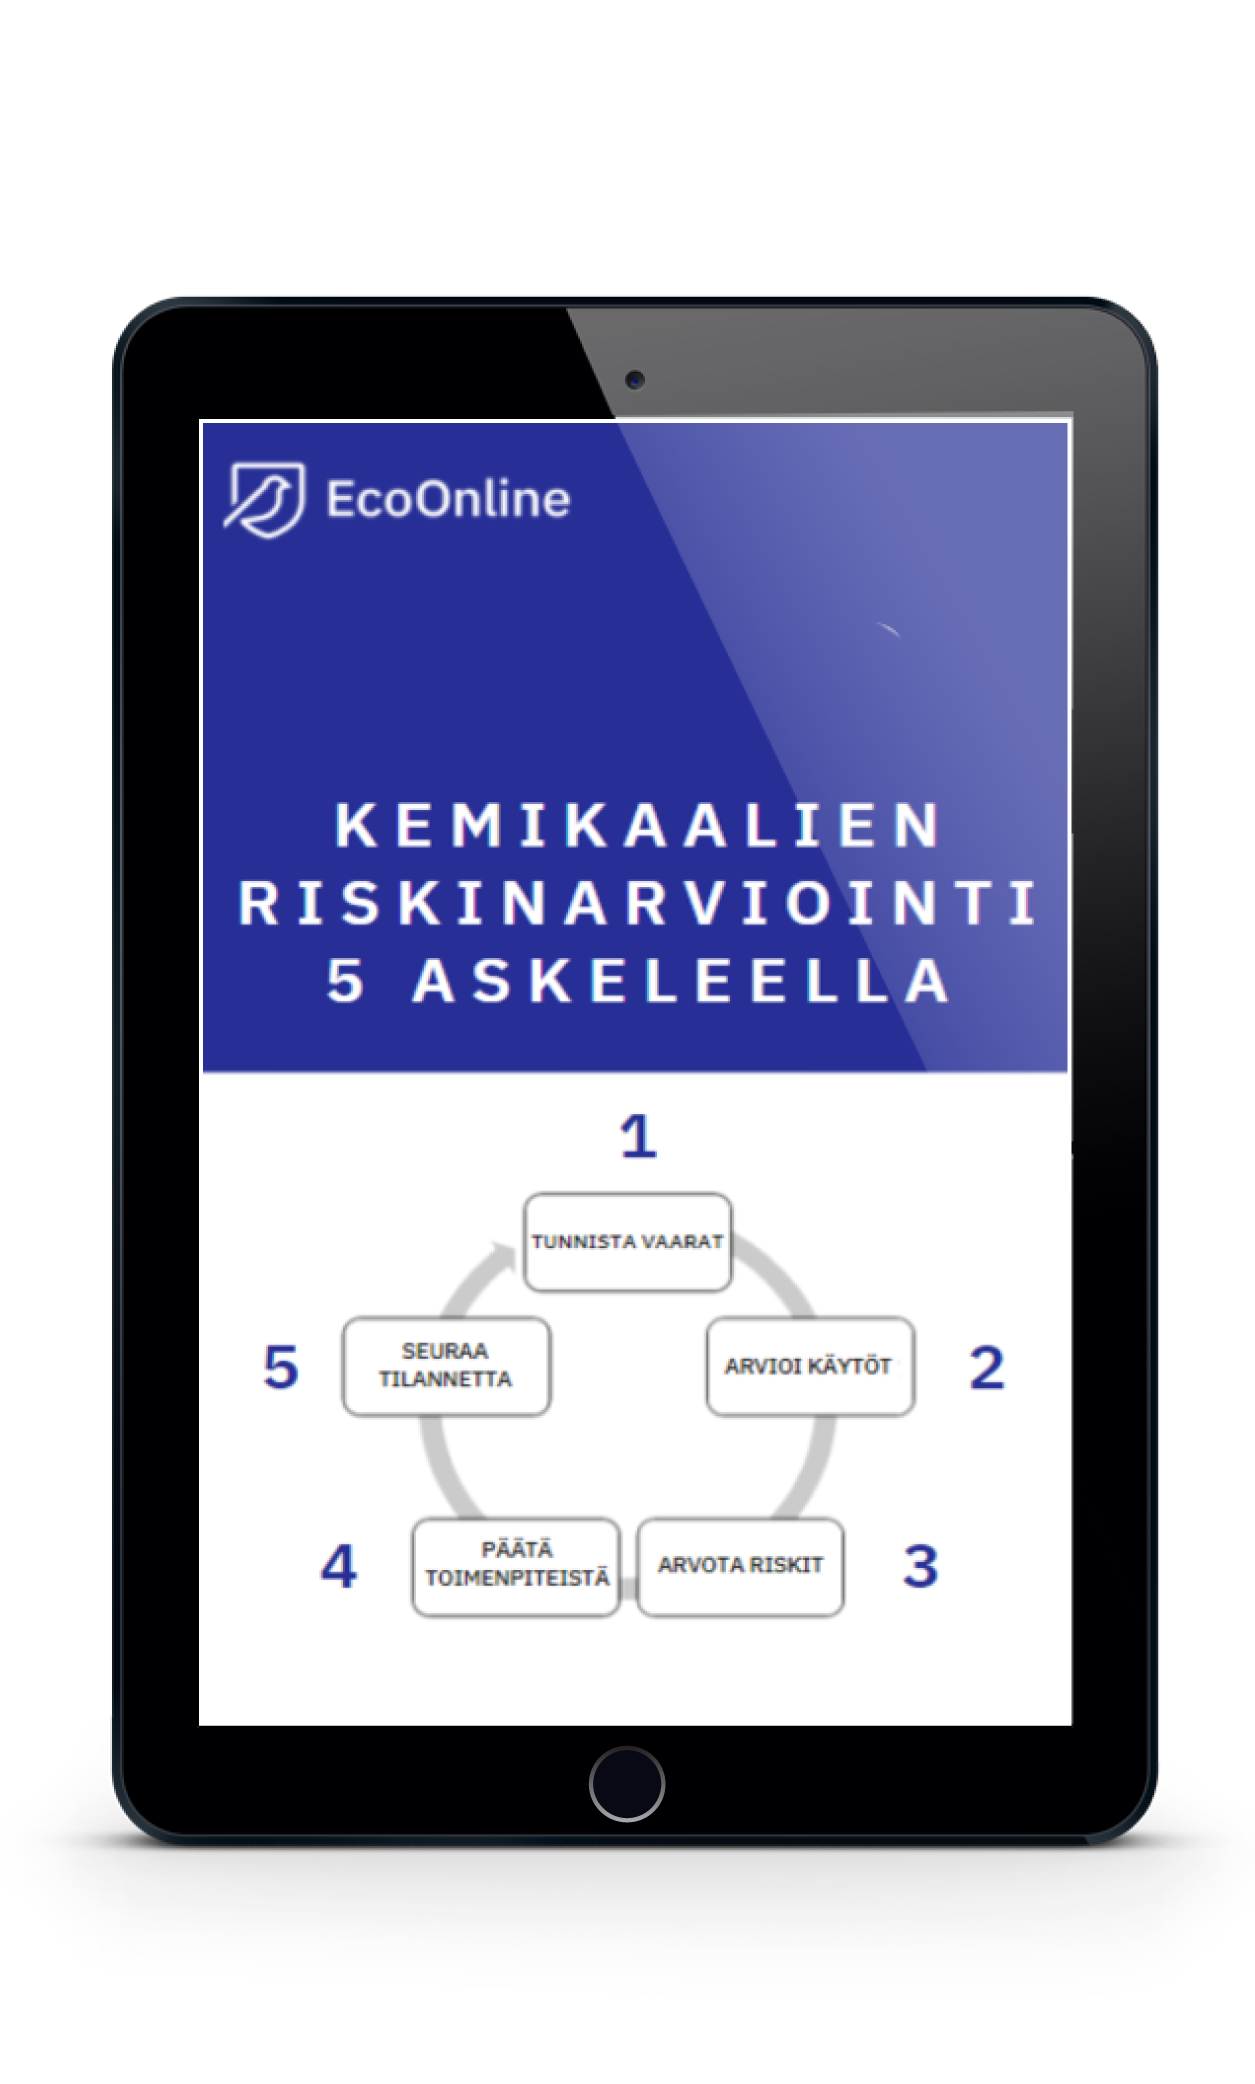 FI_Book Covers_Kemikaalien_riskinarviointi